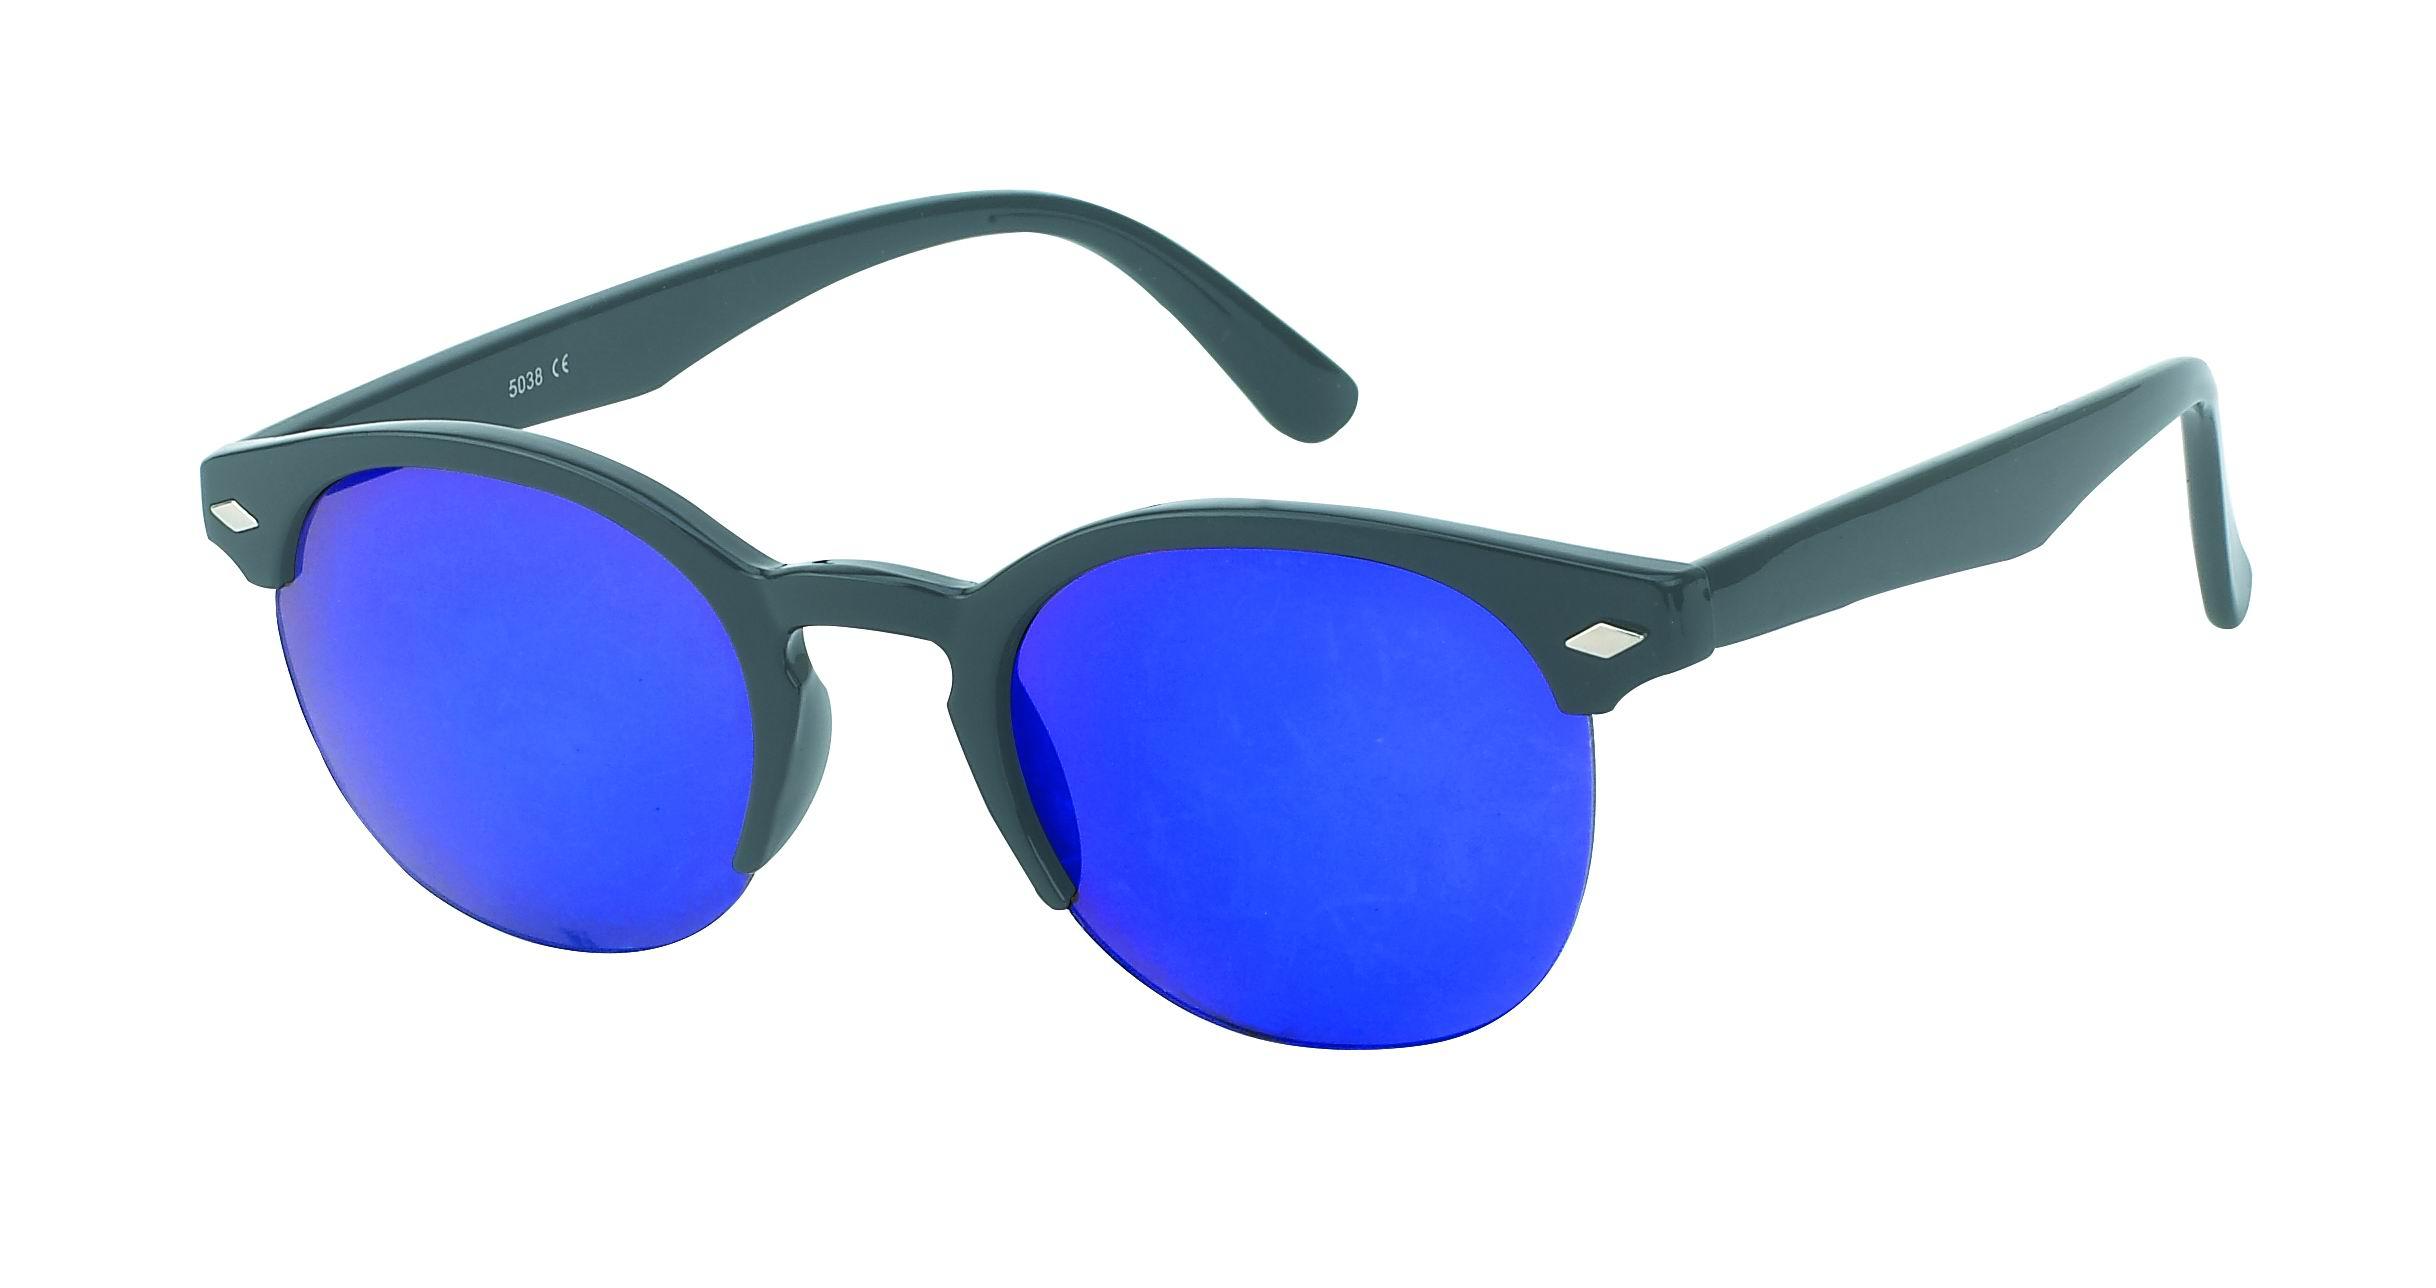 sonnenbrille rund vintage john lennon raute nerd brille. Black Bedroom Furniture Sets. Home Design Ideas